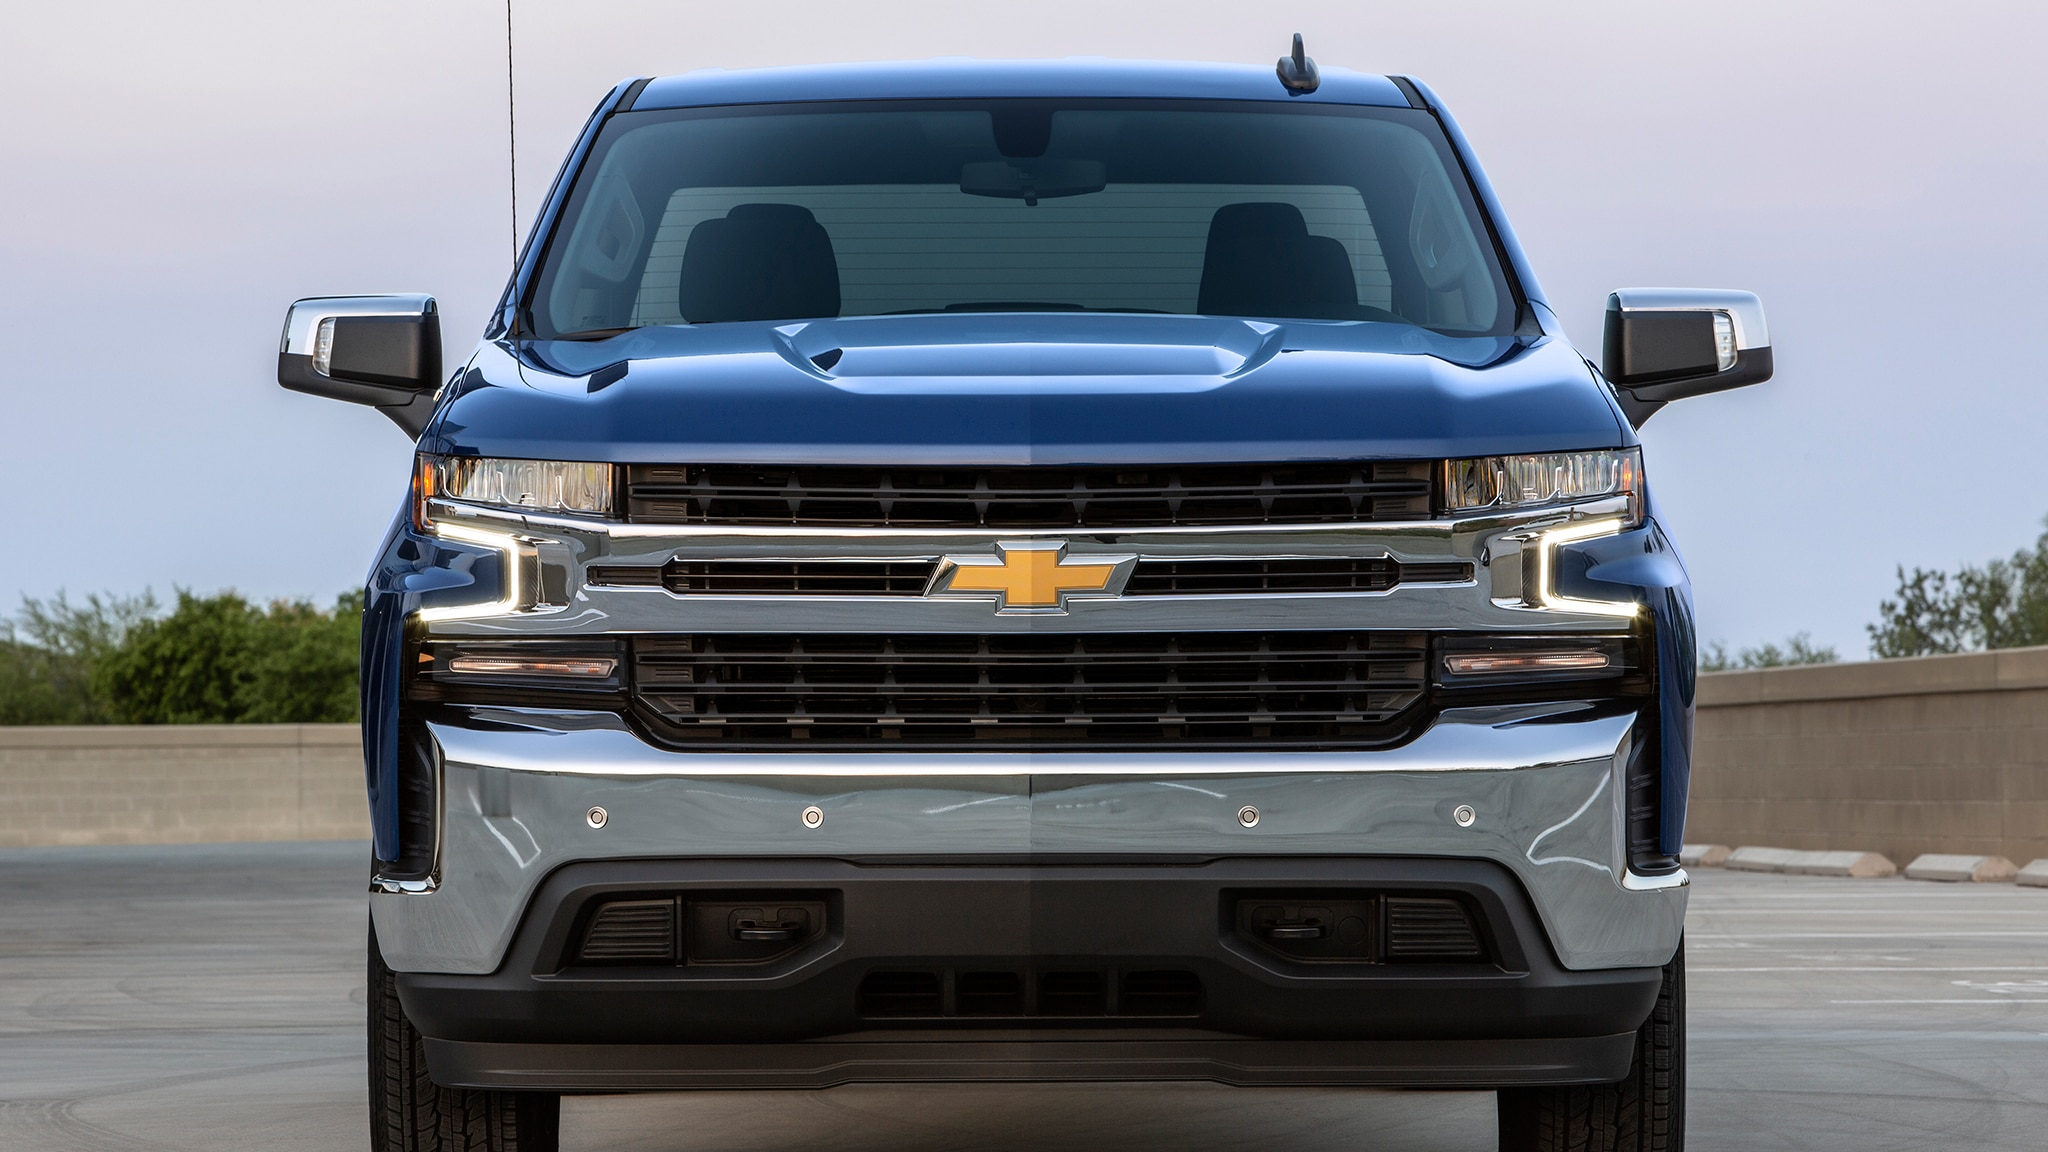 2019 Chevrolet Silverado 4-Cylinder Review | Automobile Magazine